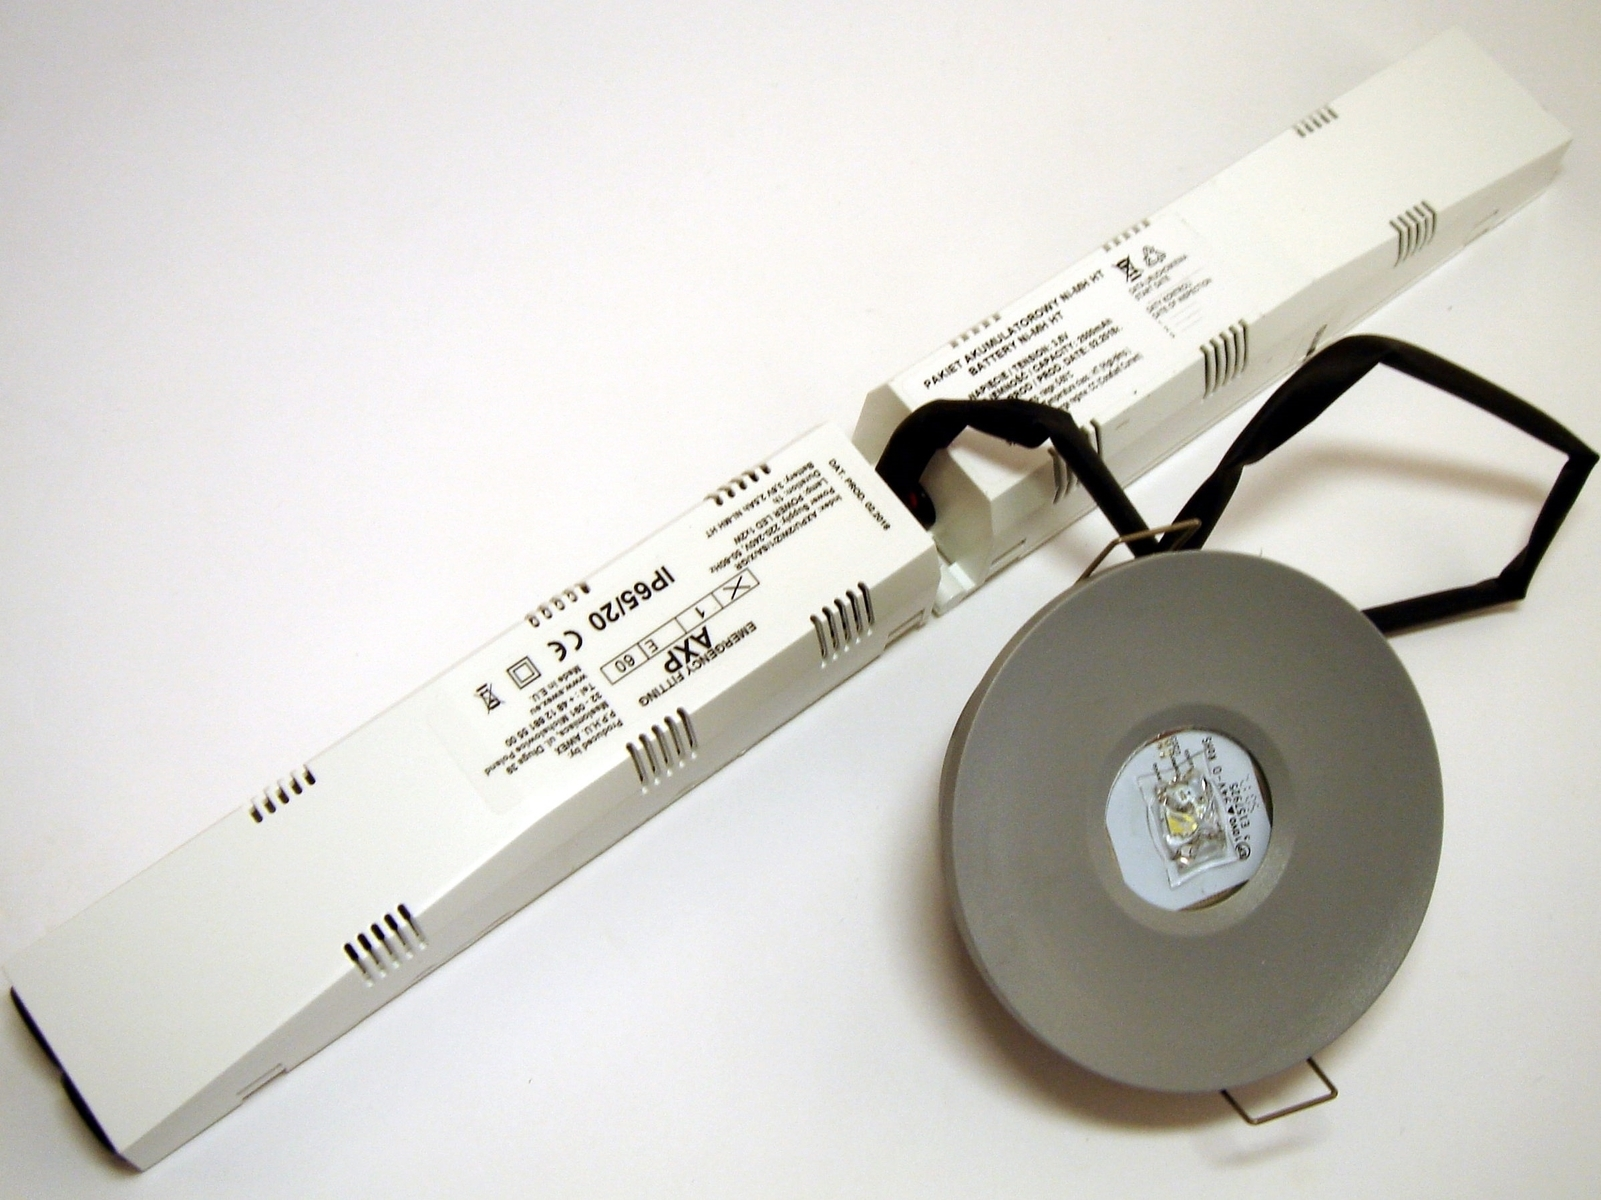 LED avariivalgusti AXPU/2W/Z/1/SA/X/GR, Awex